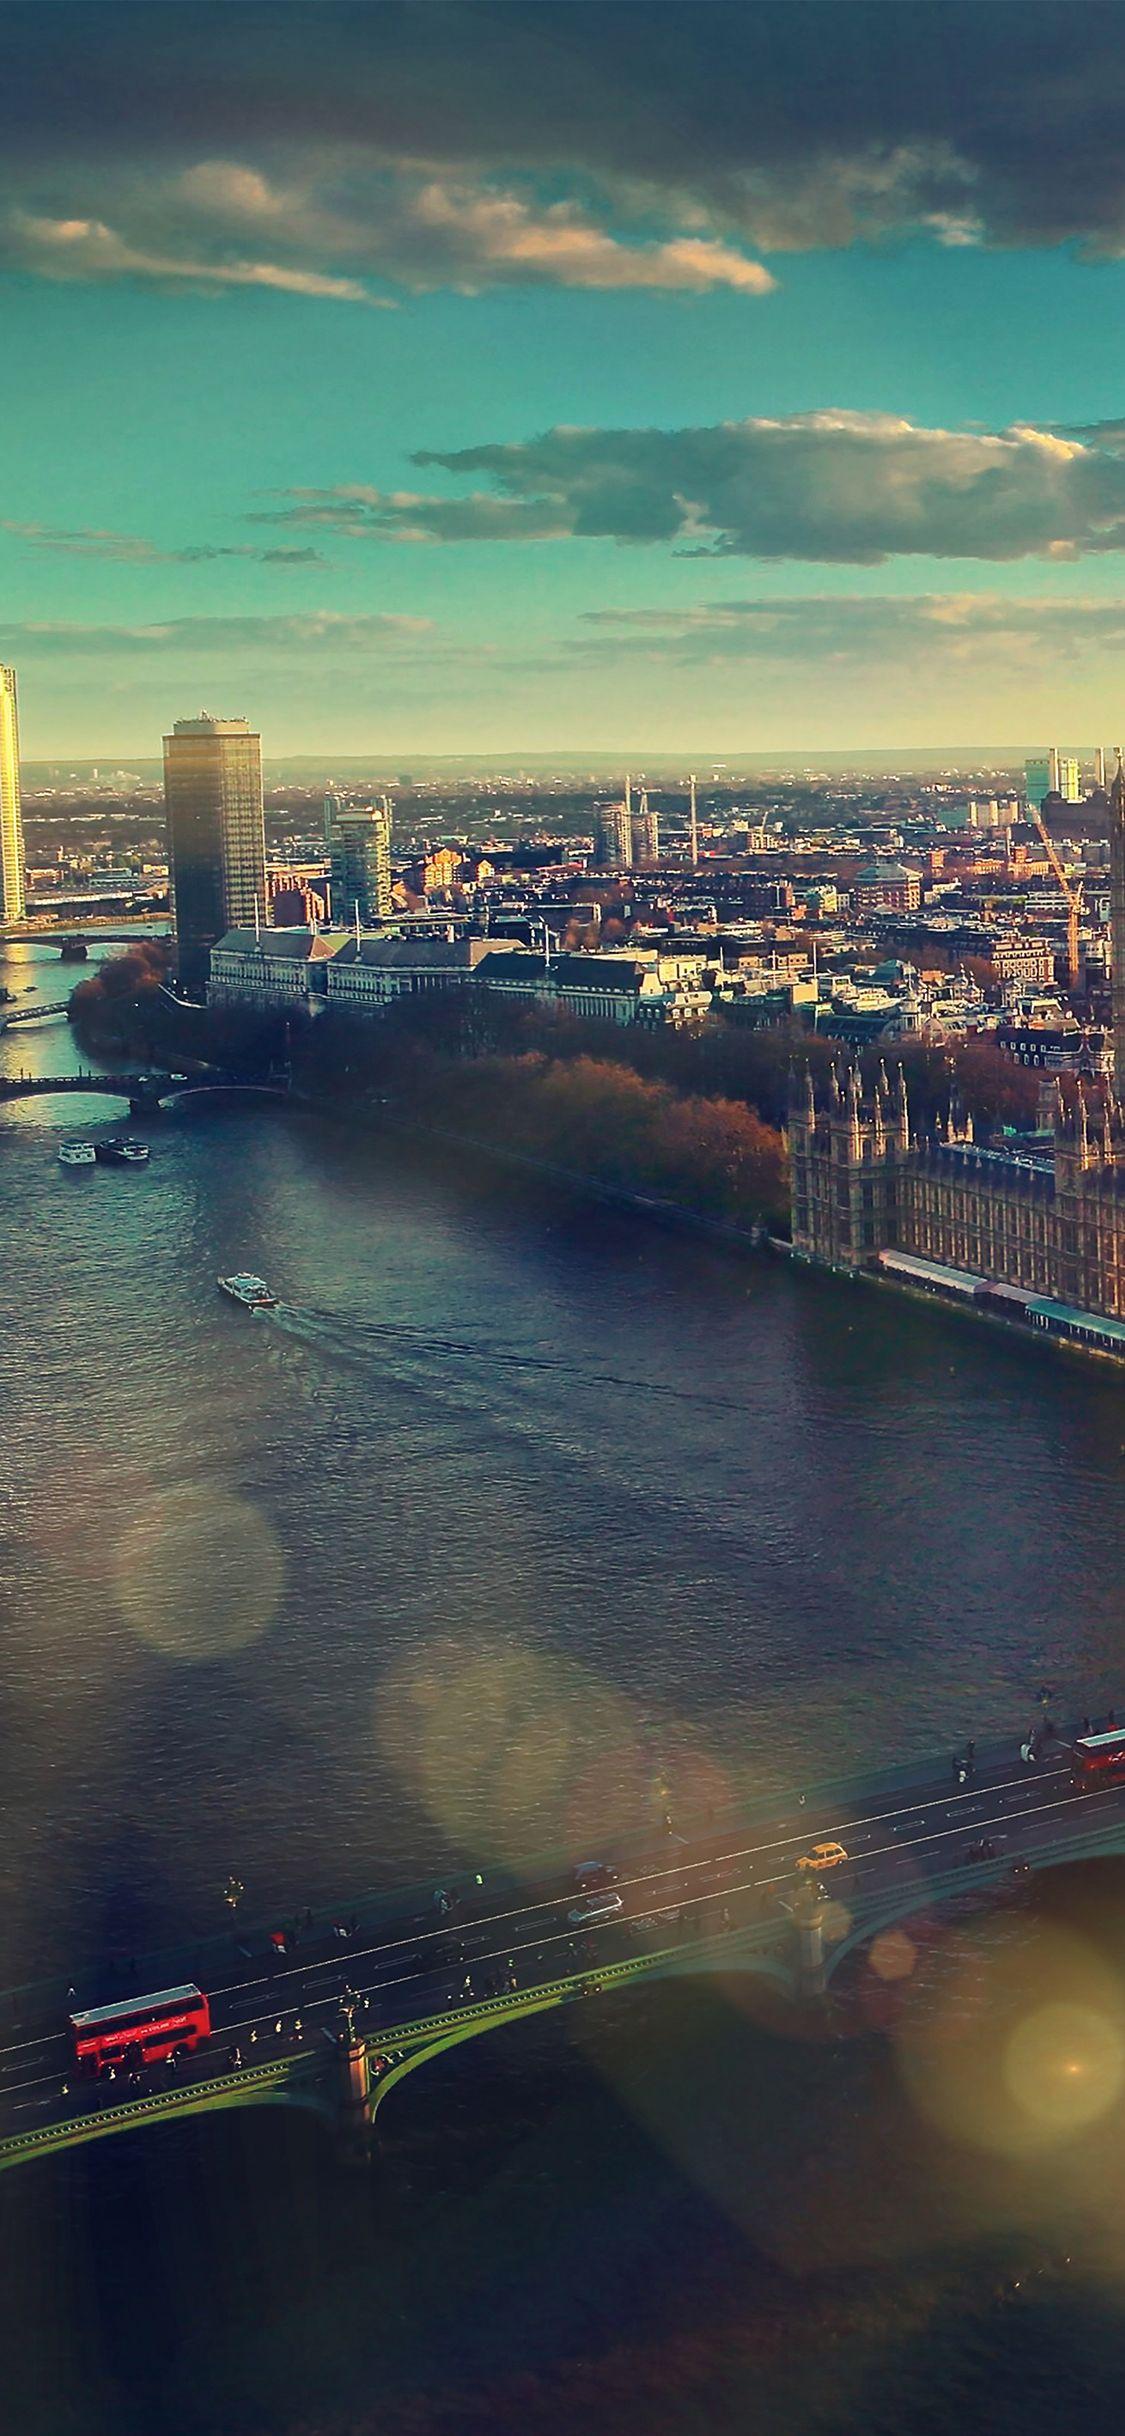 england london sky view city iphone x wallpaper | jolanta wolowicz